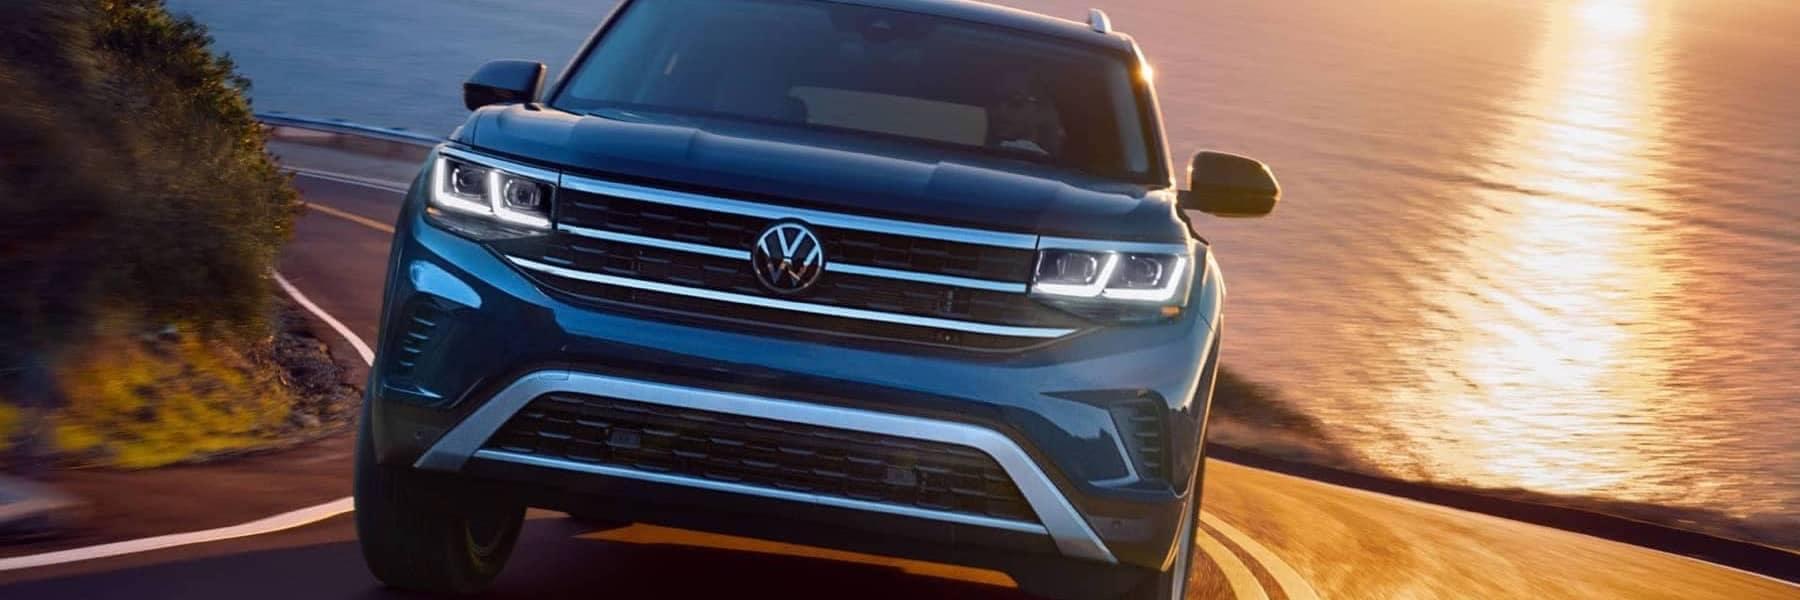 2021 Volkswagen Atlas V6 SEL with 4MOTION